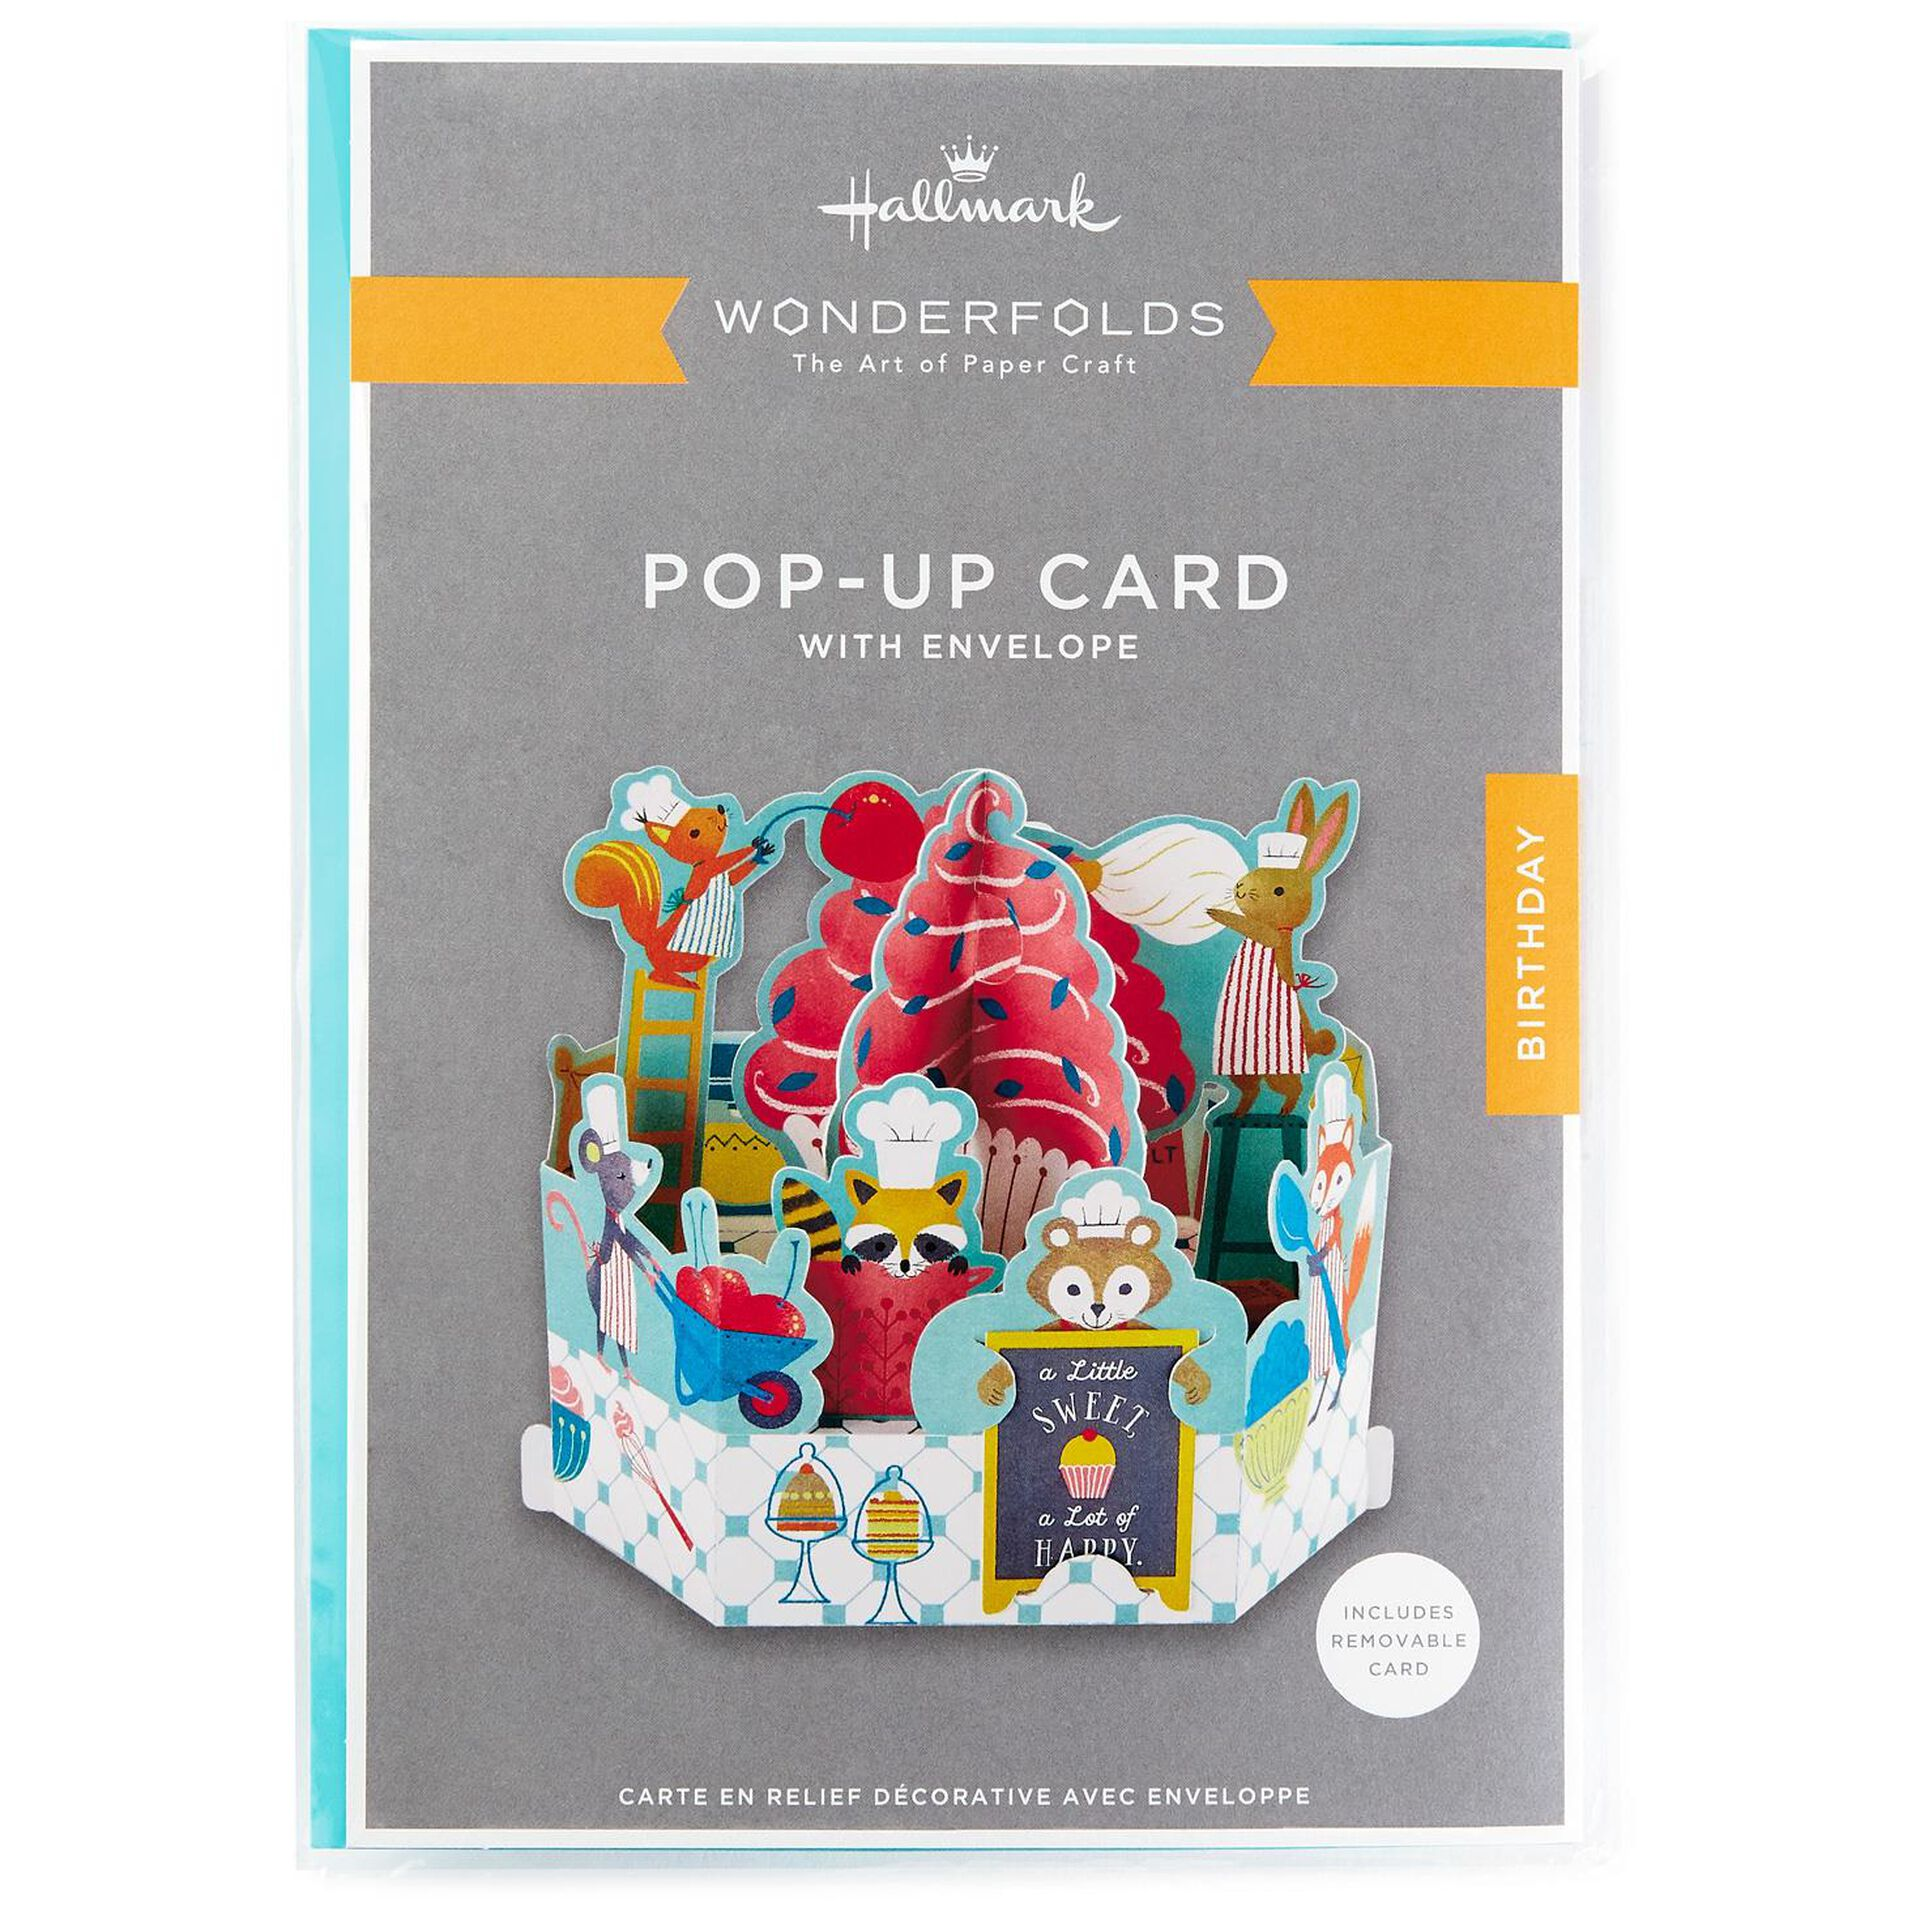 Birthday Cards Hallmark Wonderfolds Pop-Up Card With Envelope